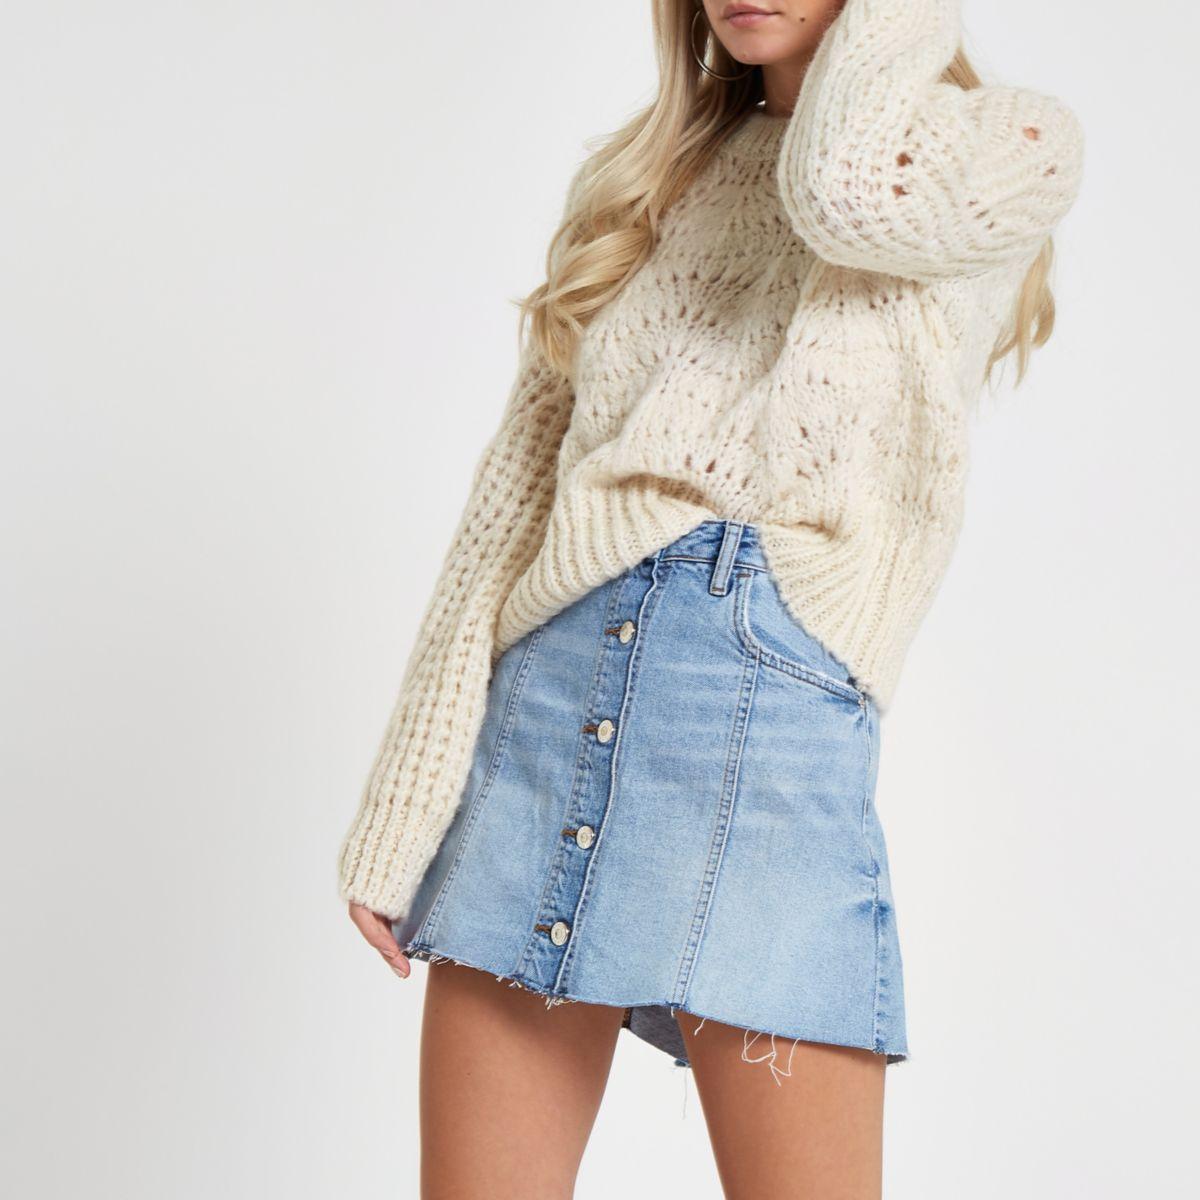 Petite cream knit jumper